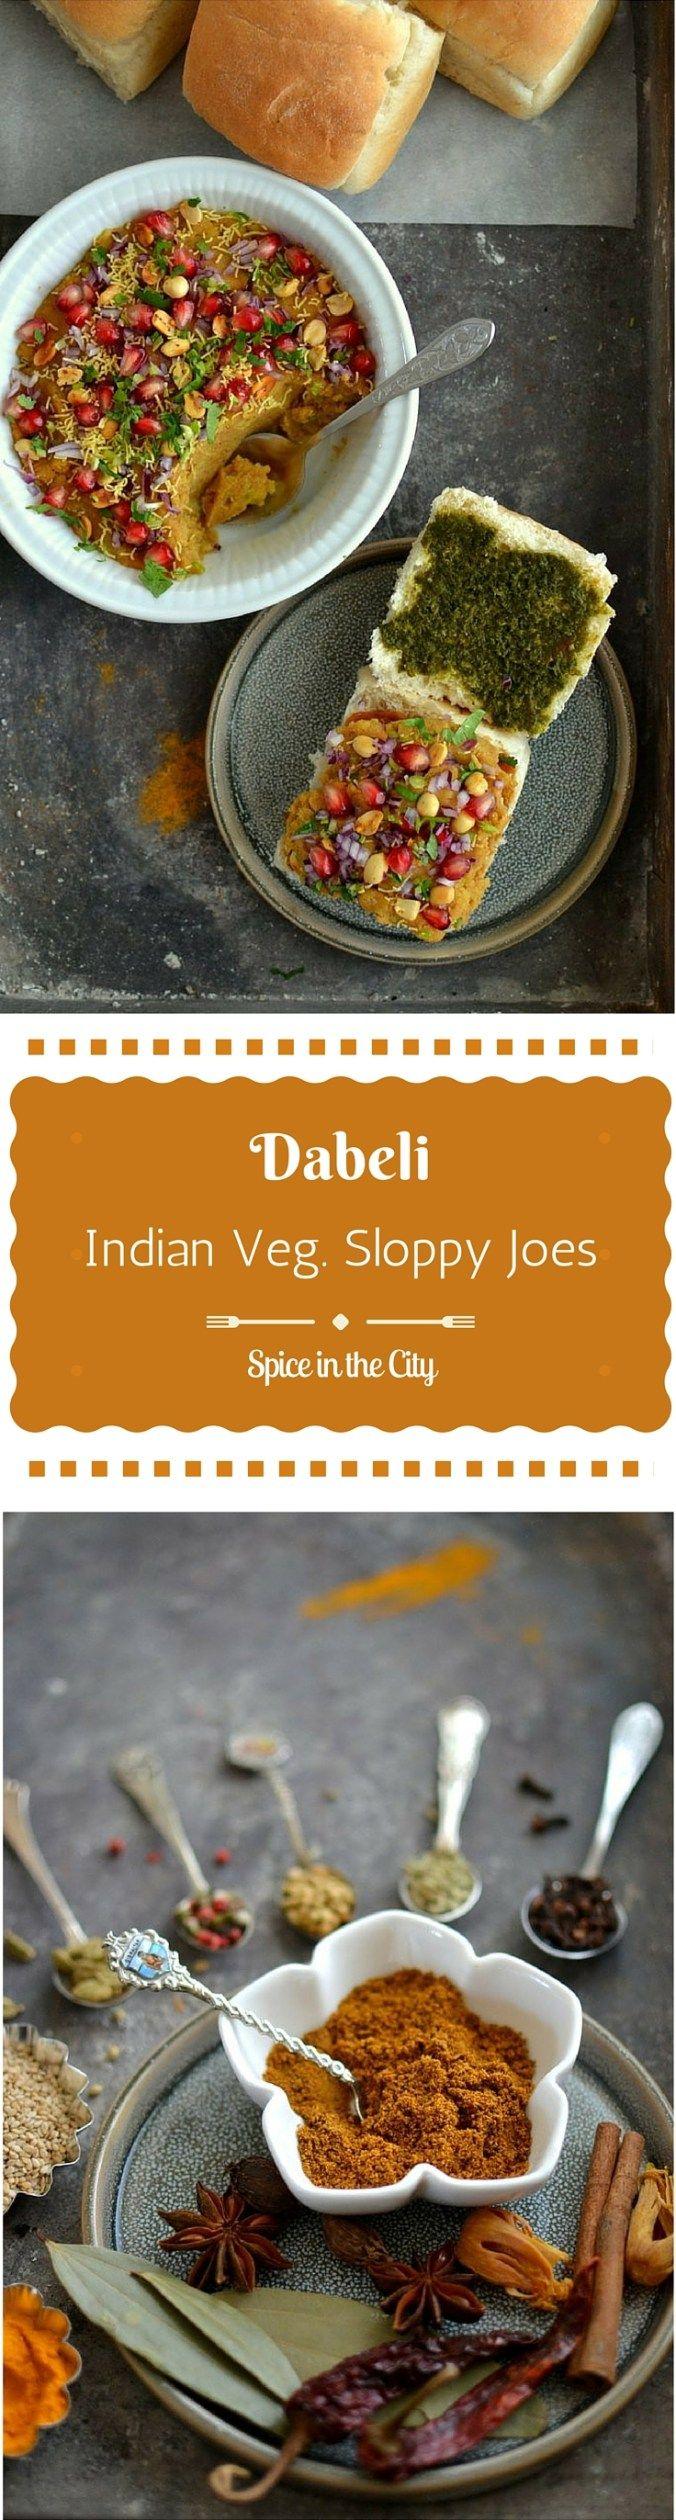 Dabeli with Homemade Dabeli Masala | Spice in the City